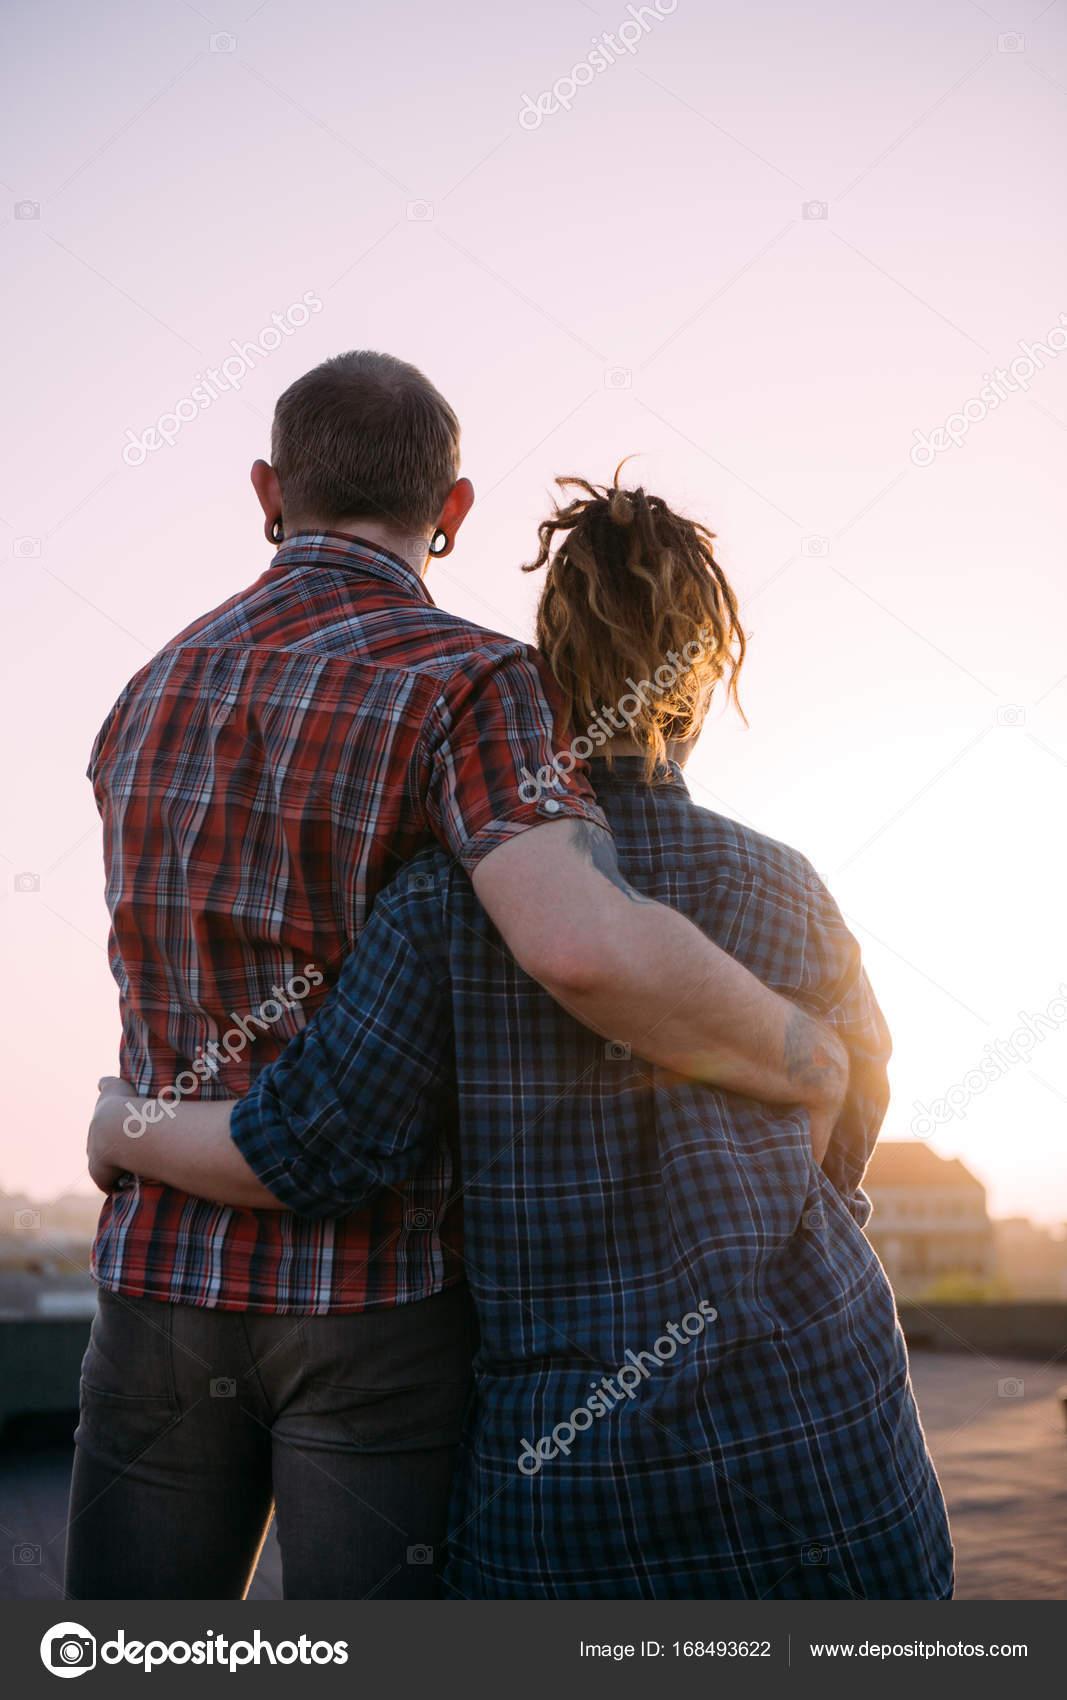 Romantic date outdoors cuddling love couple stock photo romantic date outdoors cuddling love couple stock photo altavistaventures Images